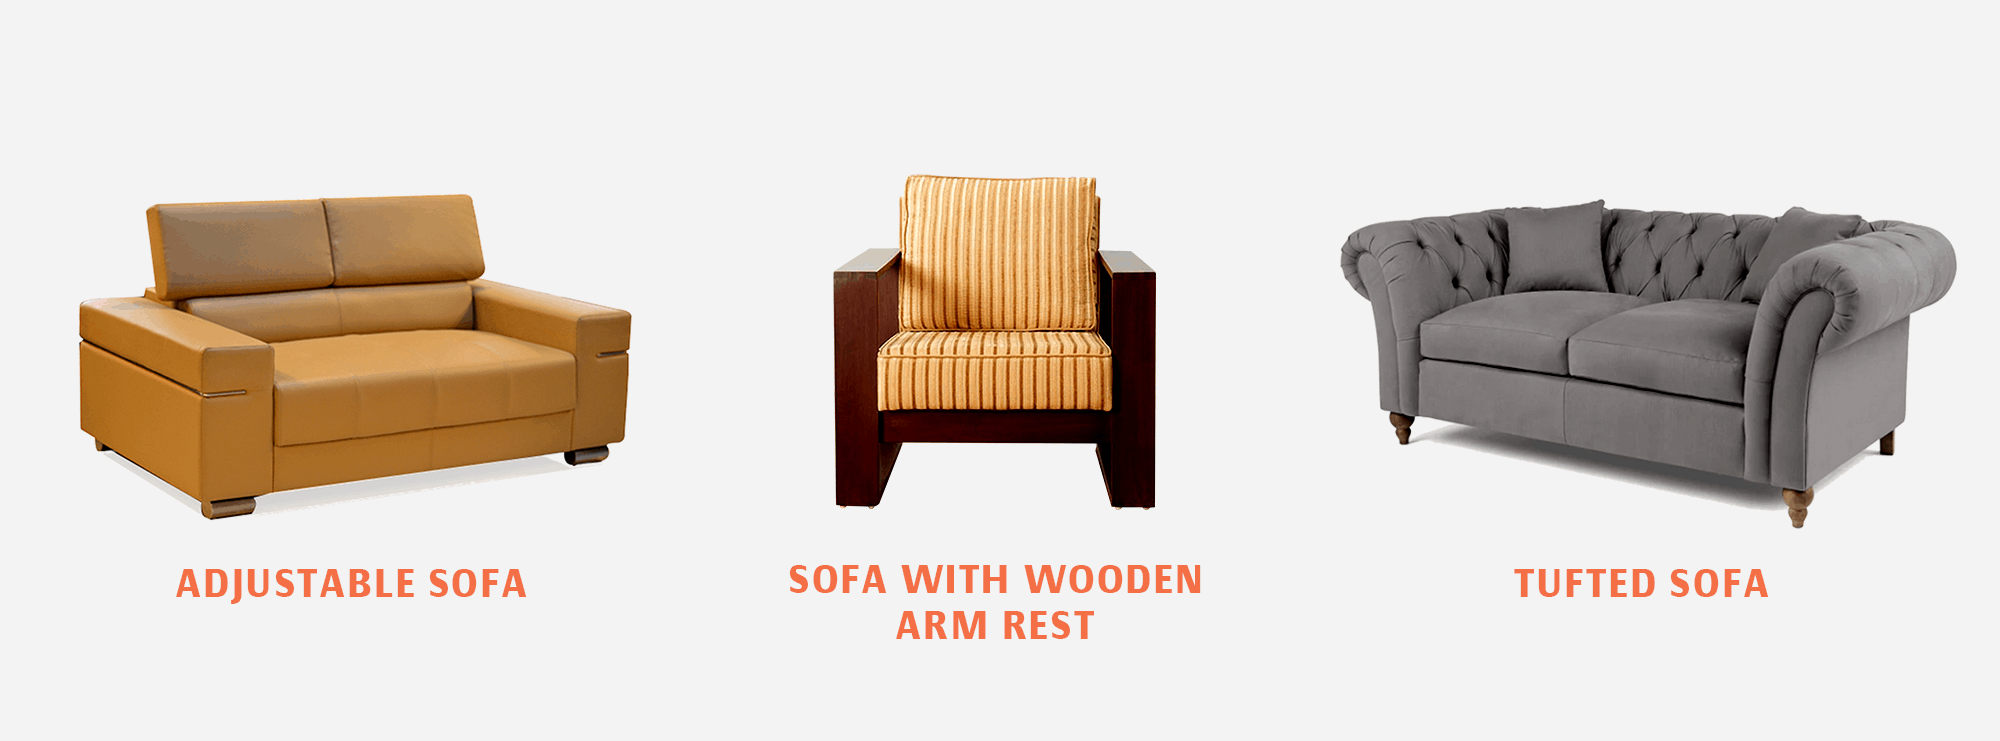 Tufted-Sofa-Chennai